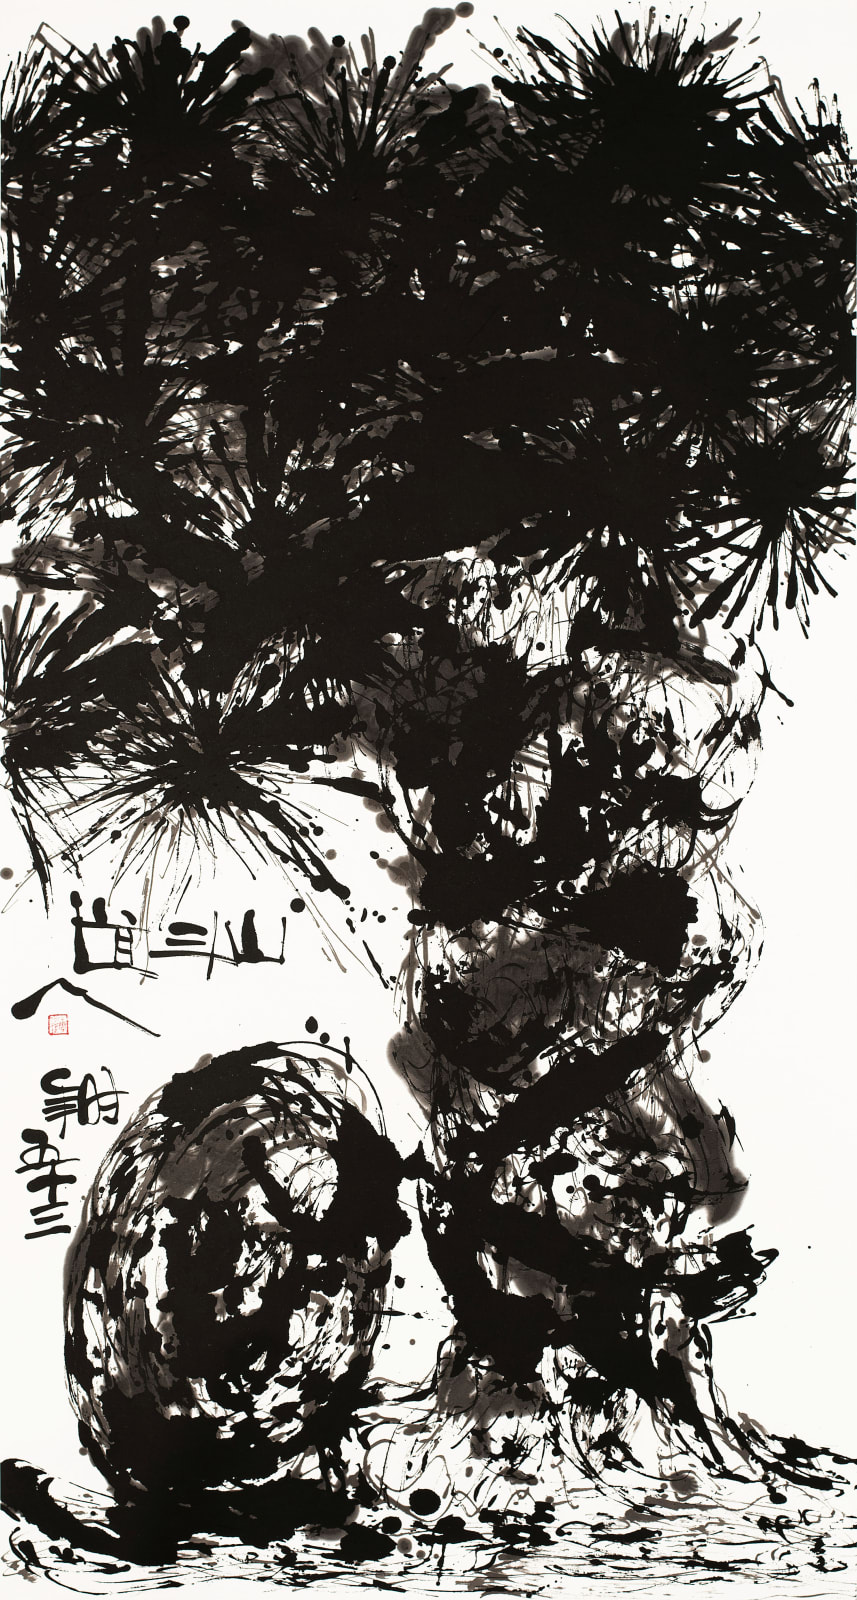 Wesley Tongson 唐家偉, Pine 松 No. 1123, 2010